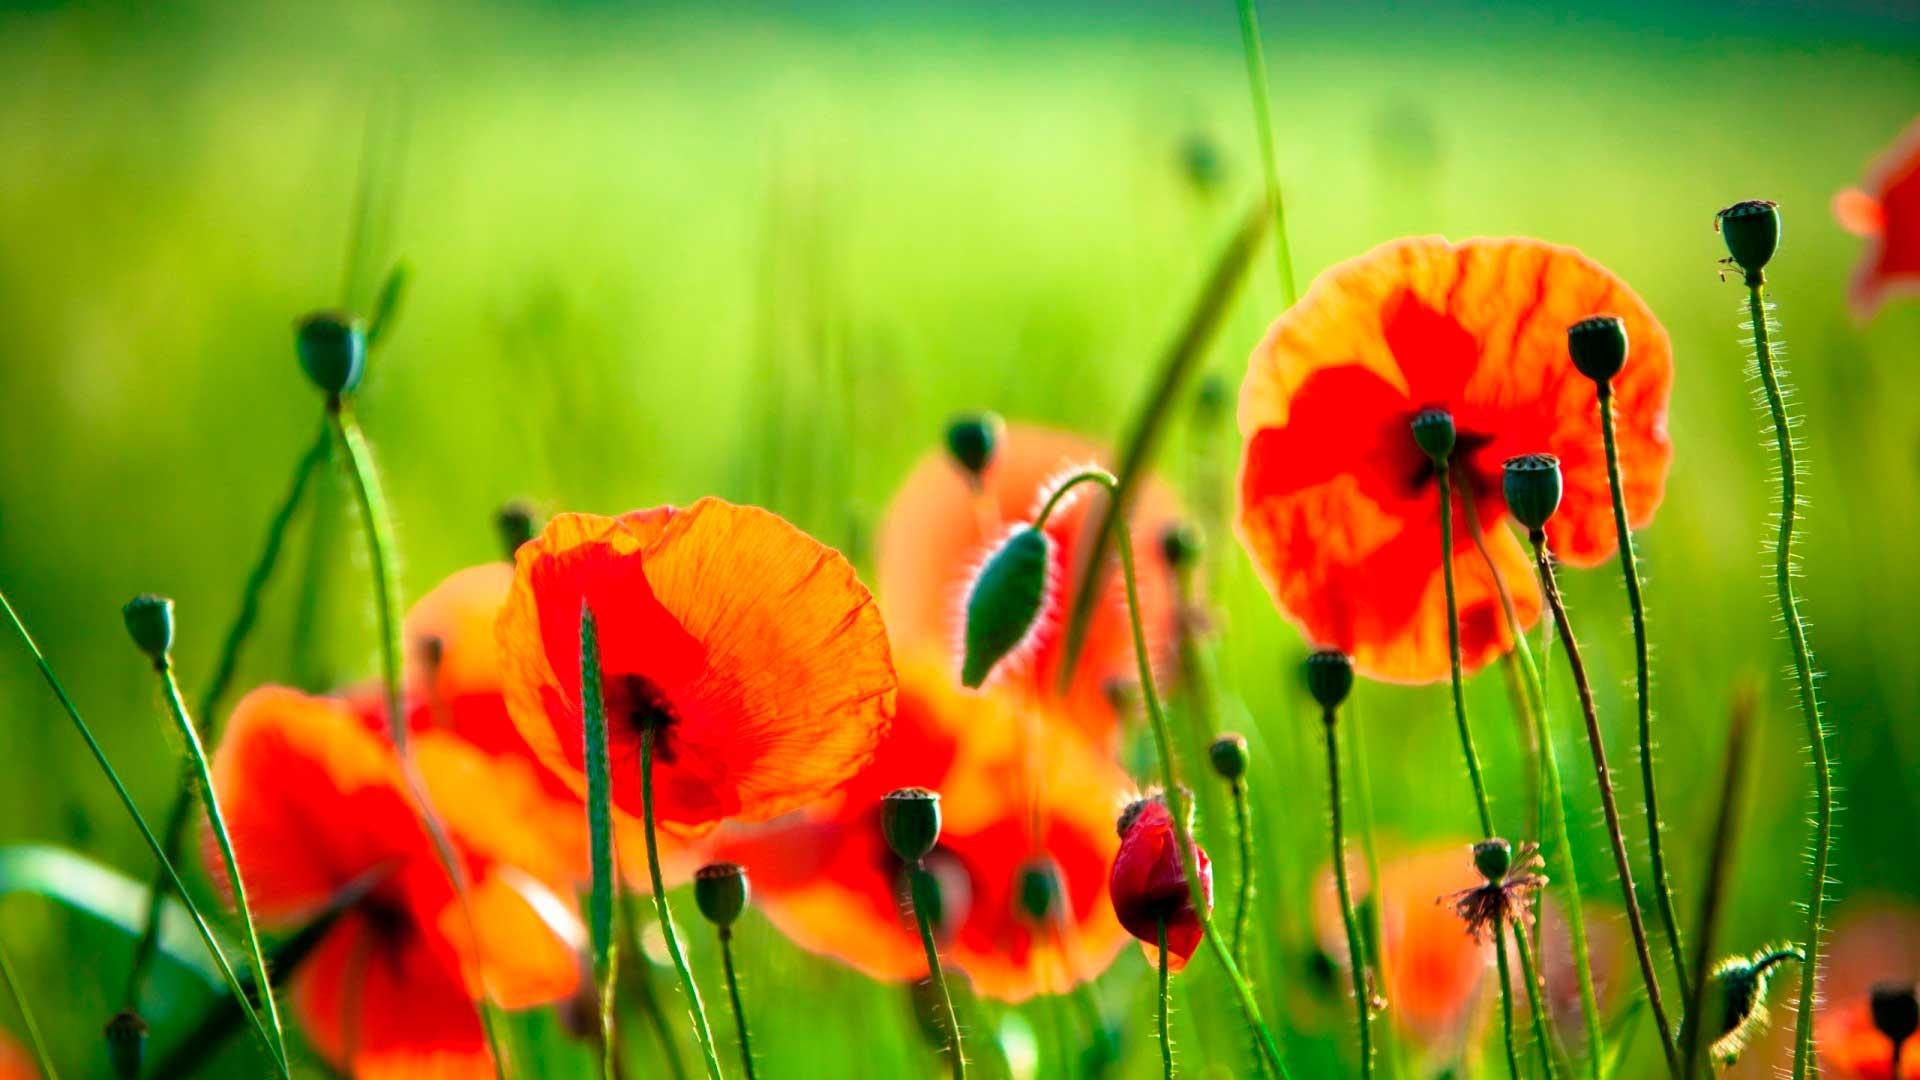 Фото цветы в лучах солнца 66